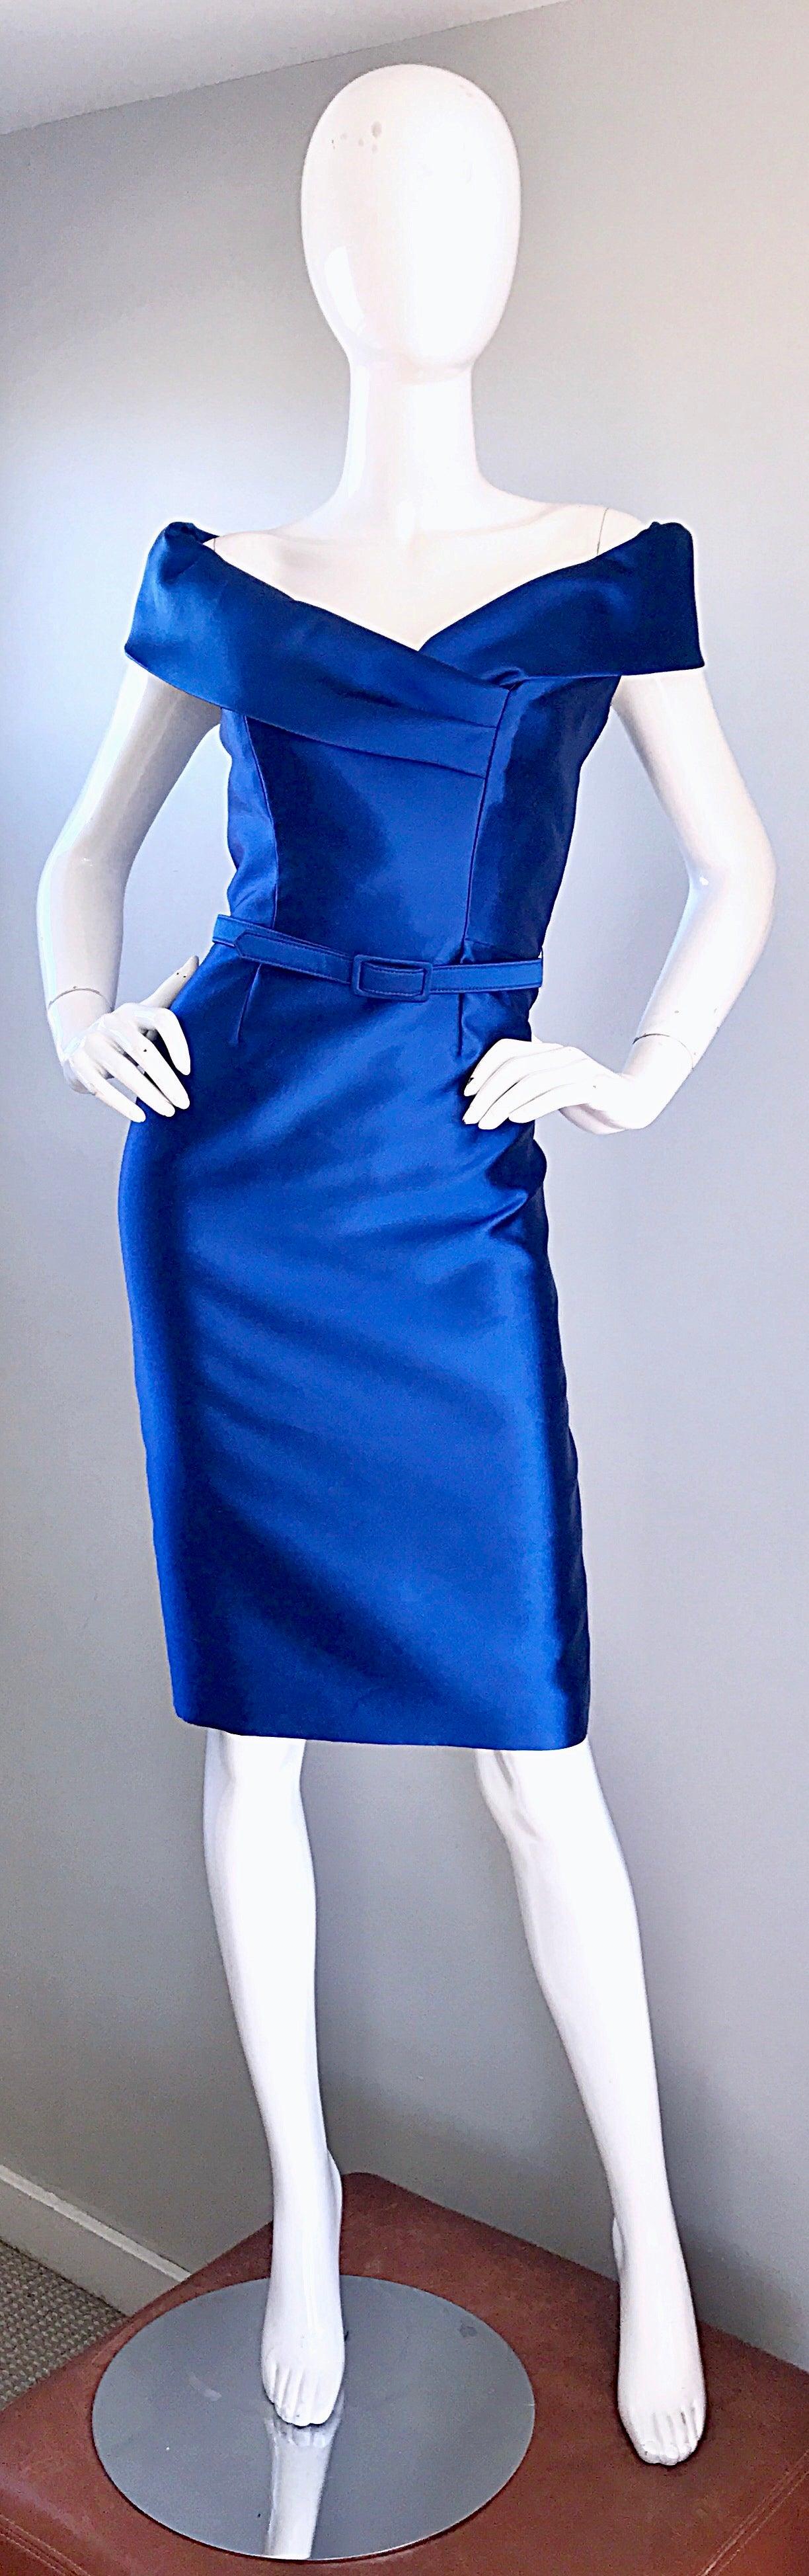 55f28c1e0afb59 Catherine Regehr Saks 5th Ave Royal Blue Silk Off - Shoulder Belted Dress  Size 6 For Sale at 1stdibs